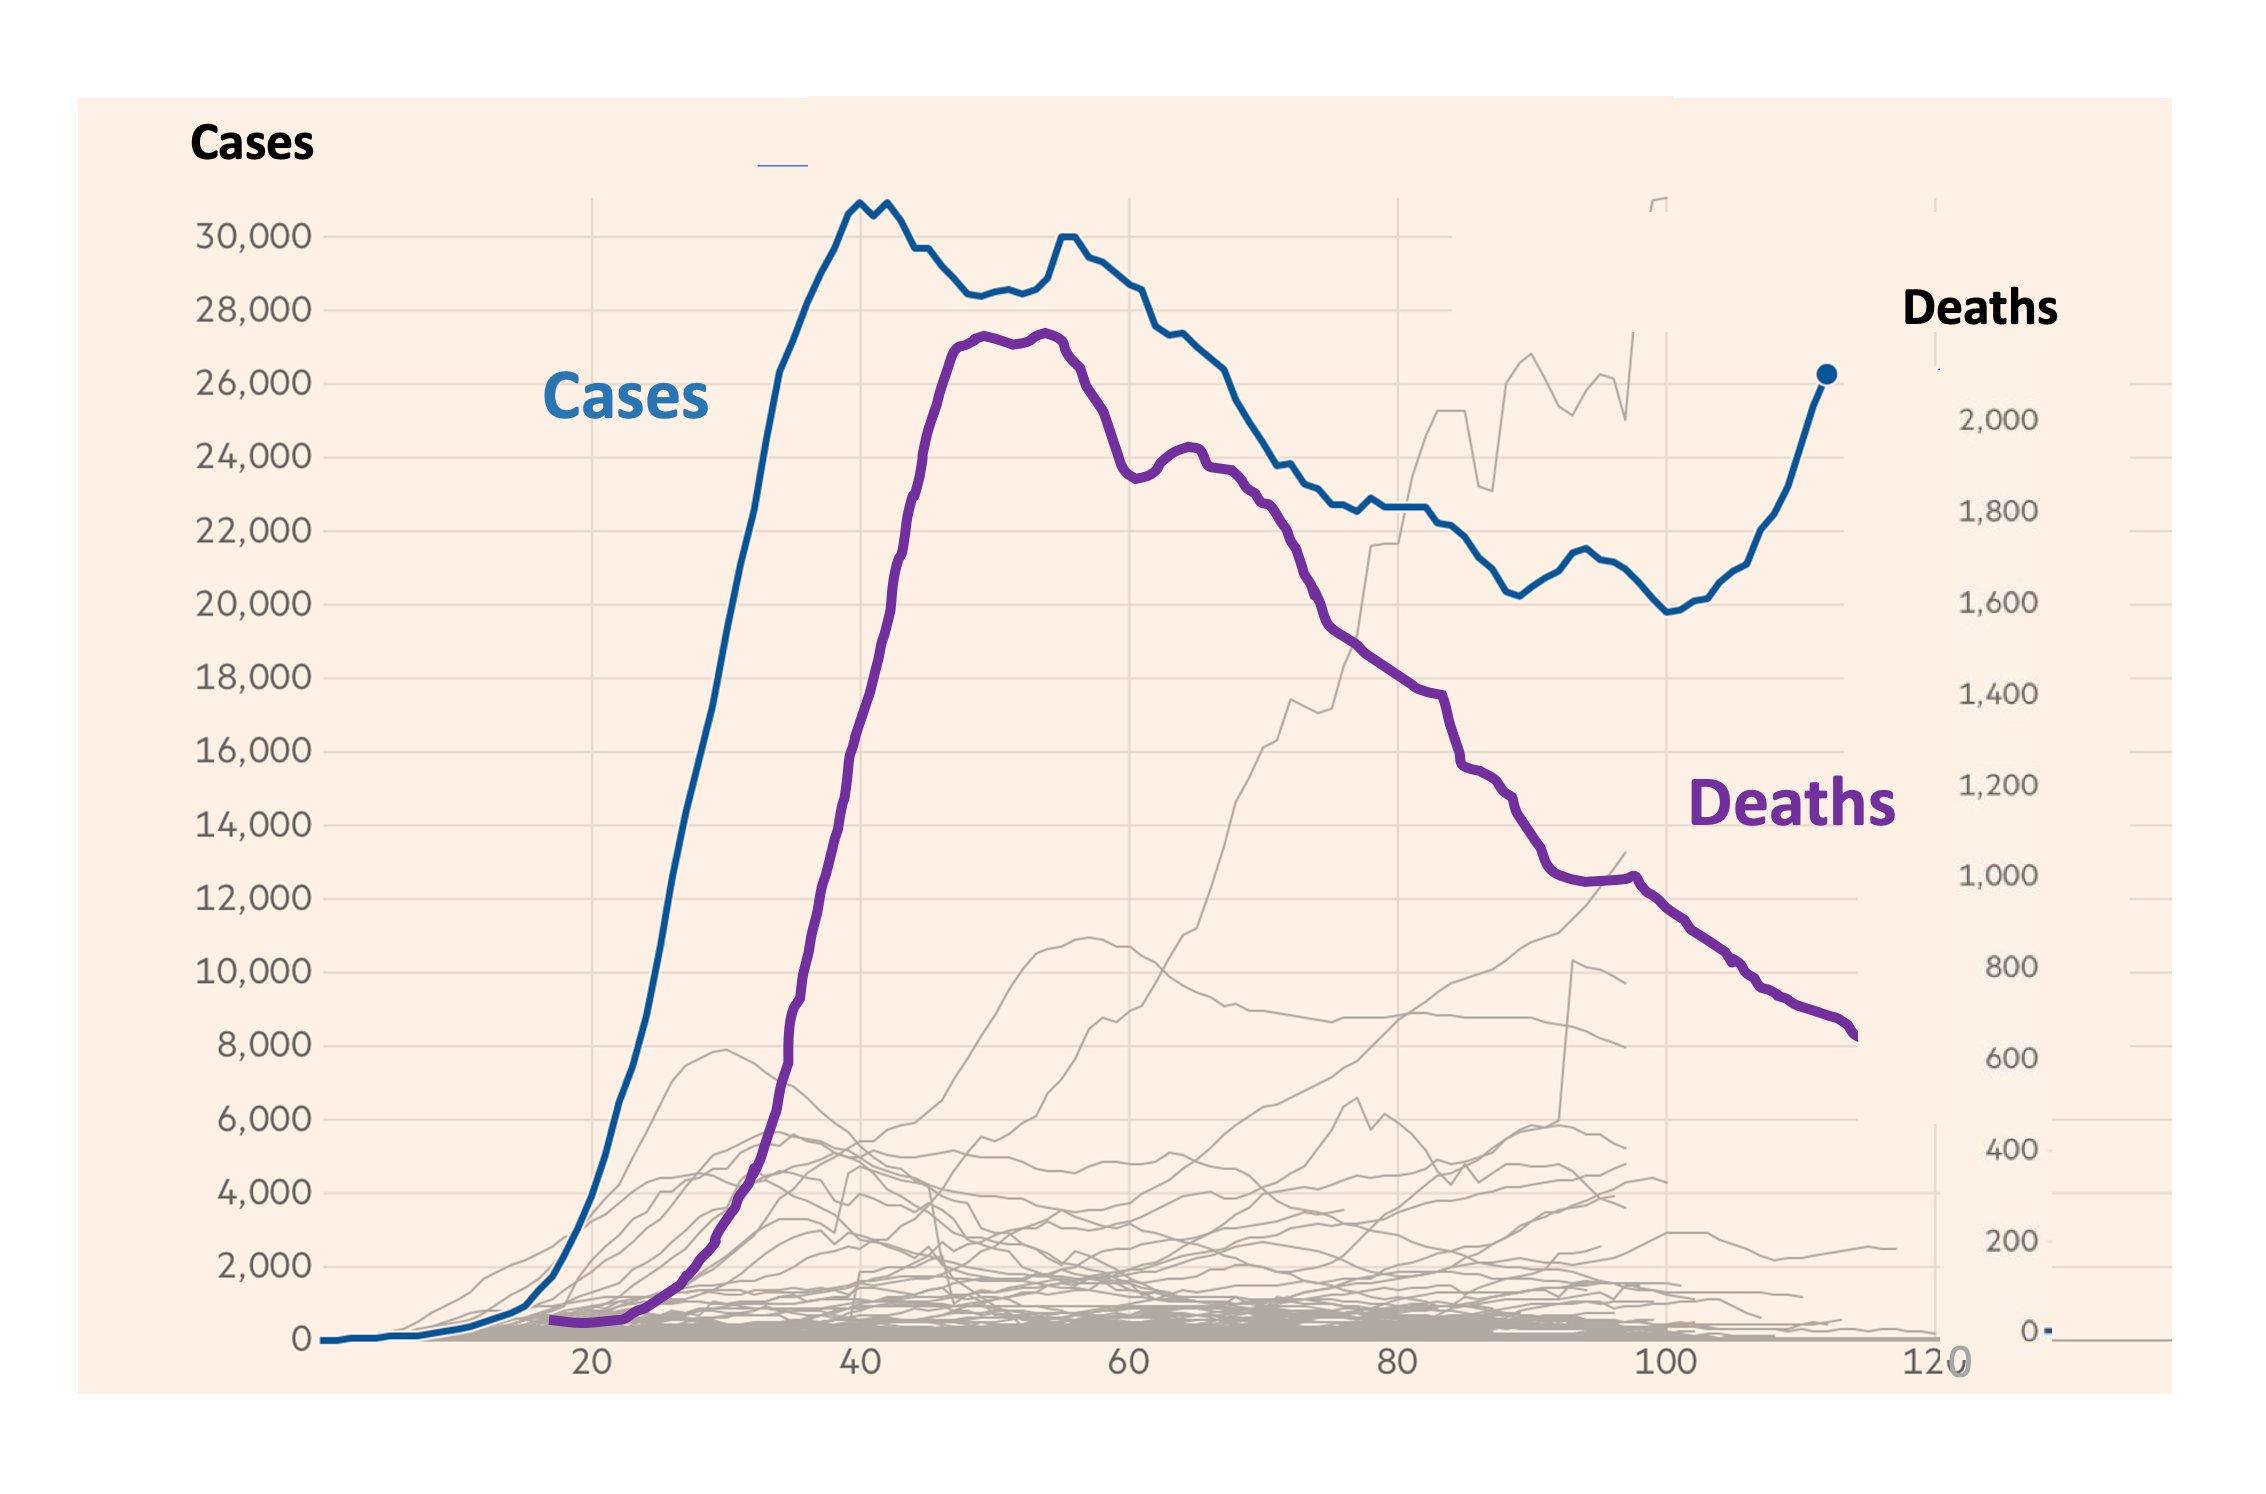 Coronavirus Deaths Plummeting